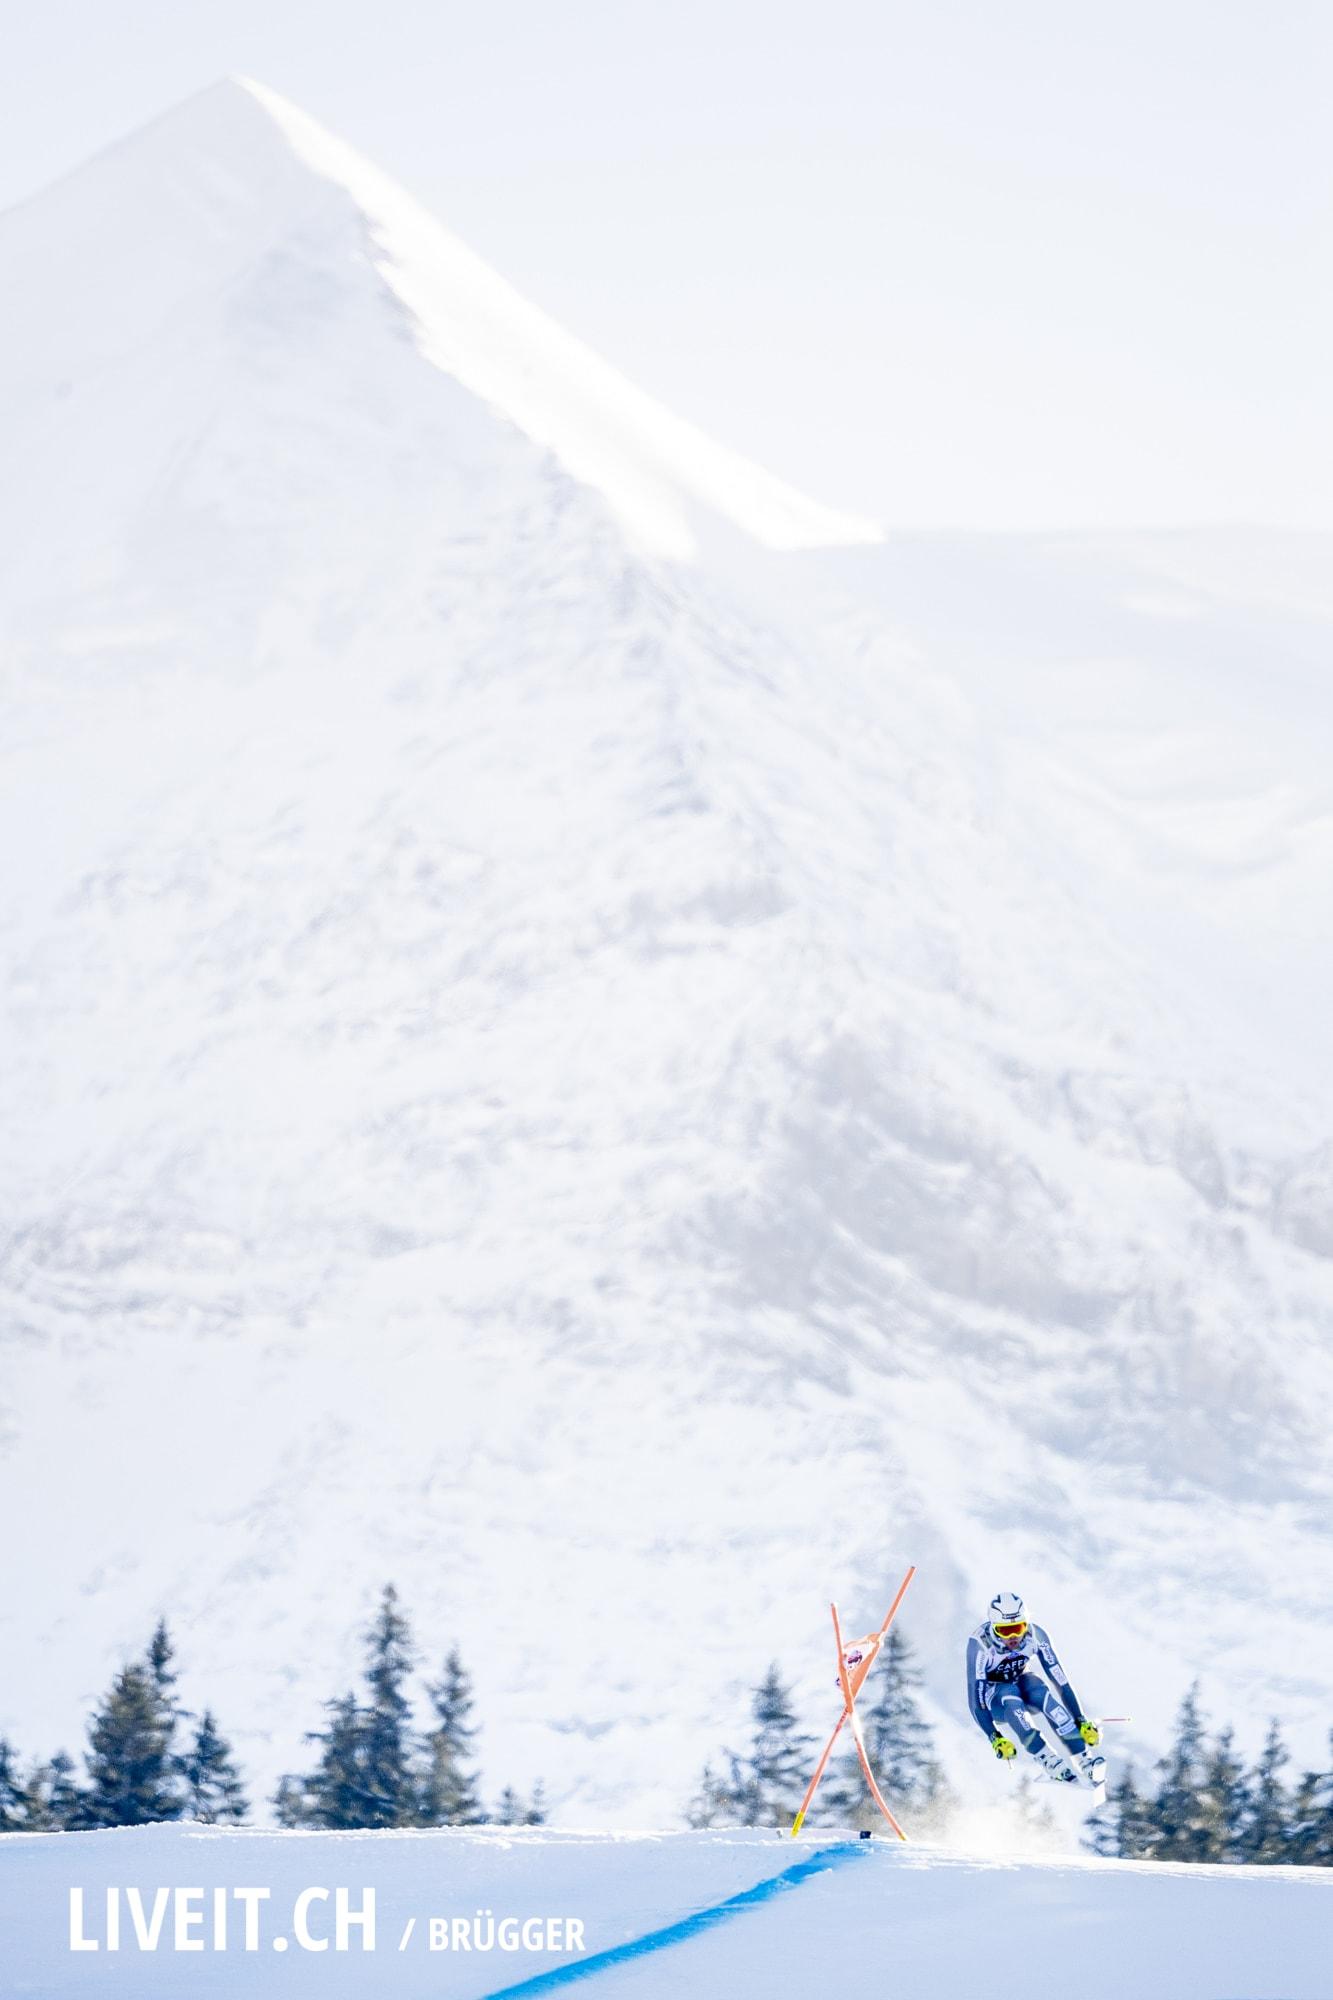 Aleksander Aamodt Kilde (NOR) fotografiert am Samstag, 19. Januar 2019 am Lauberhornrennen in der Disziplin: Abfahrt. (Fotografiert von Dominic Bruegger liveit.ch)